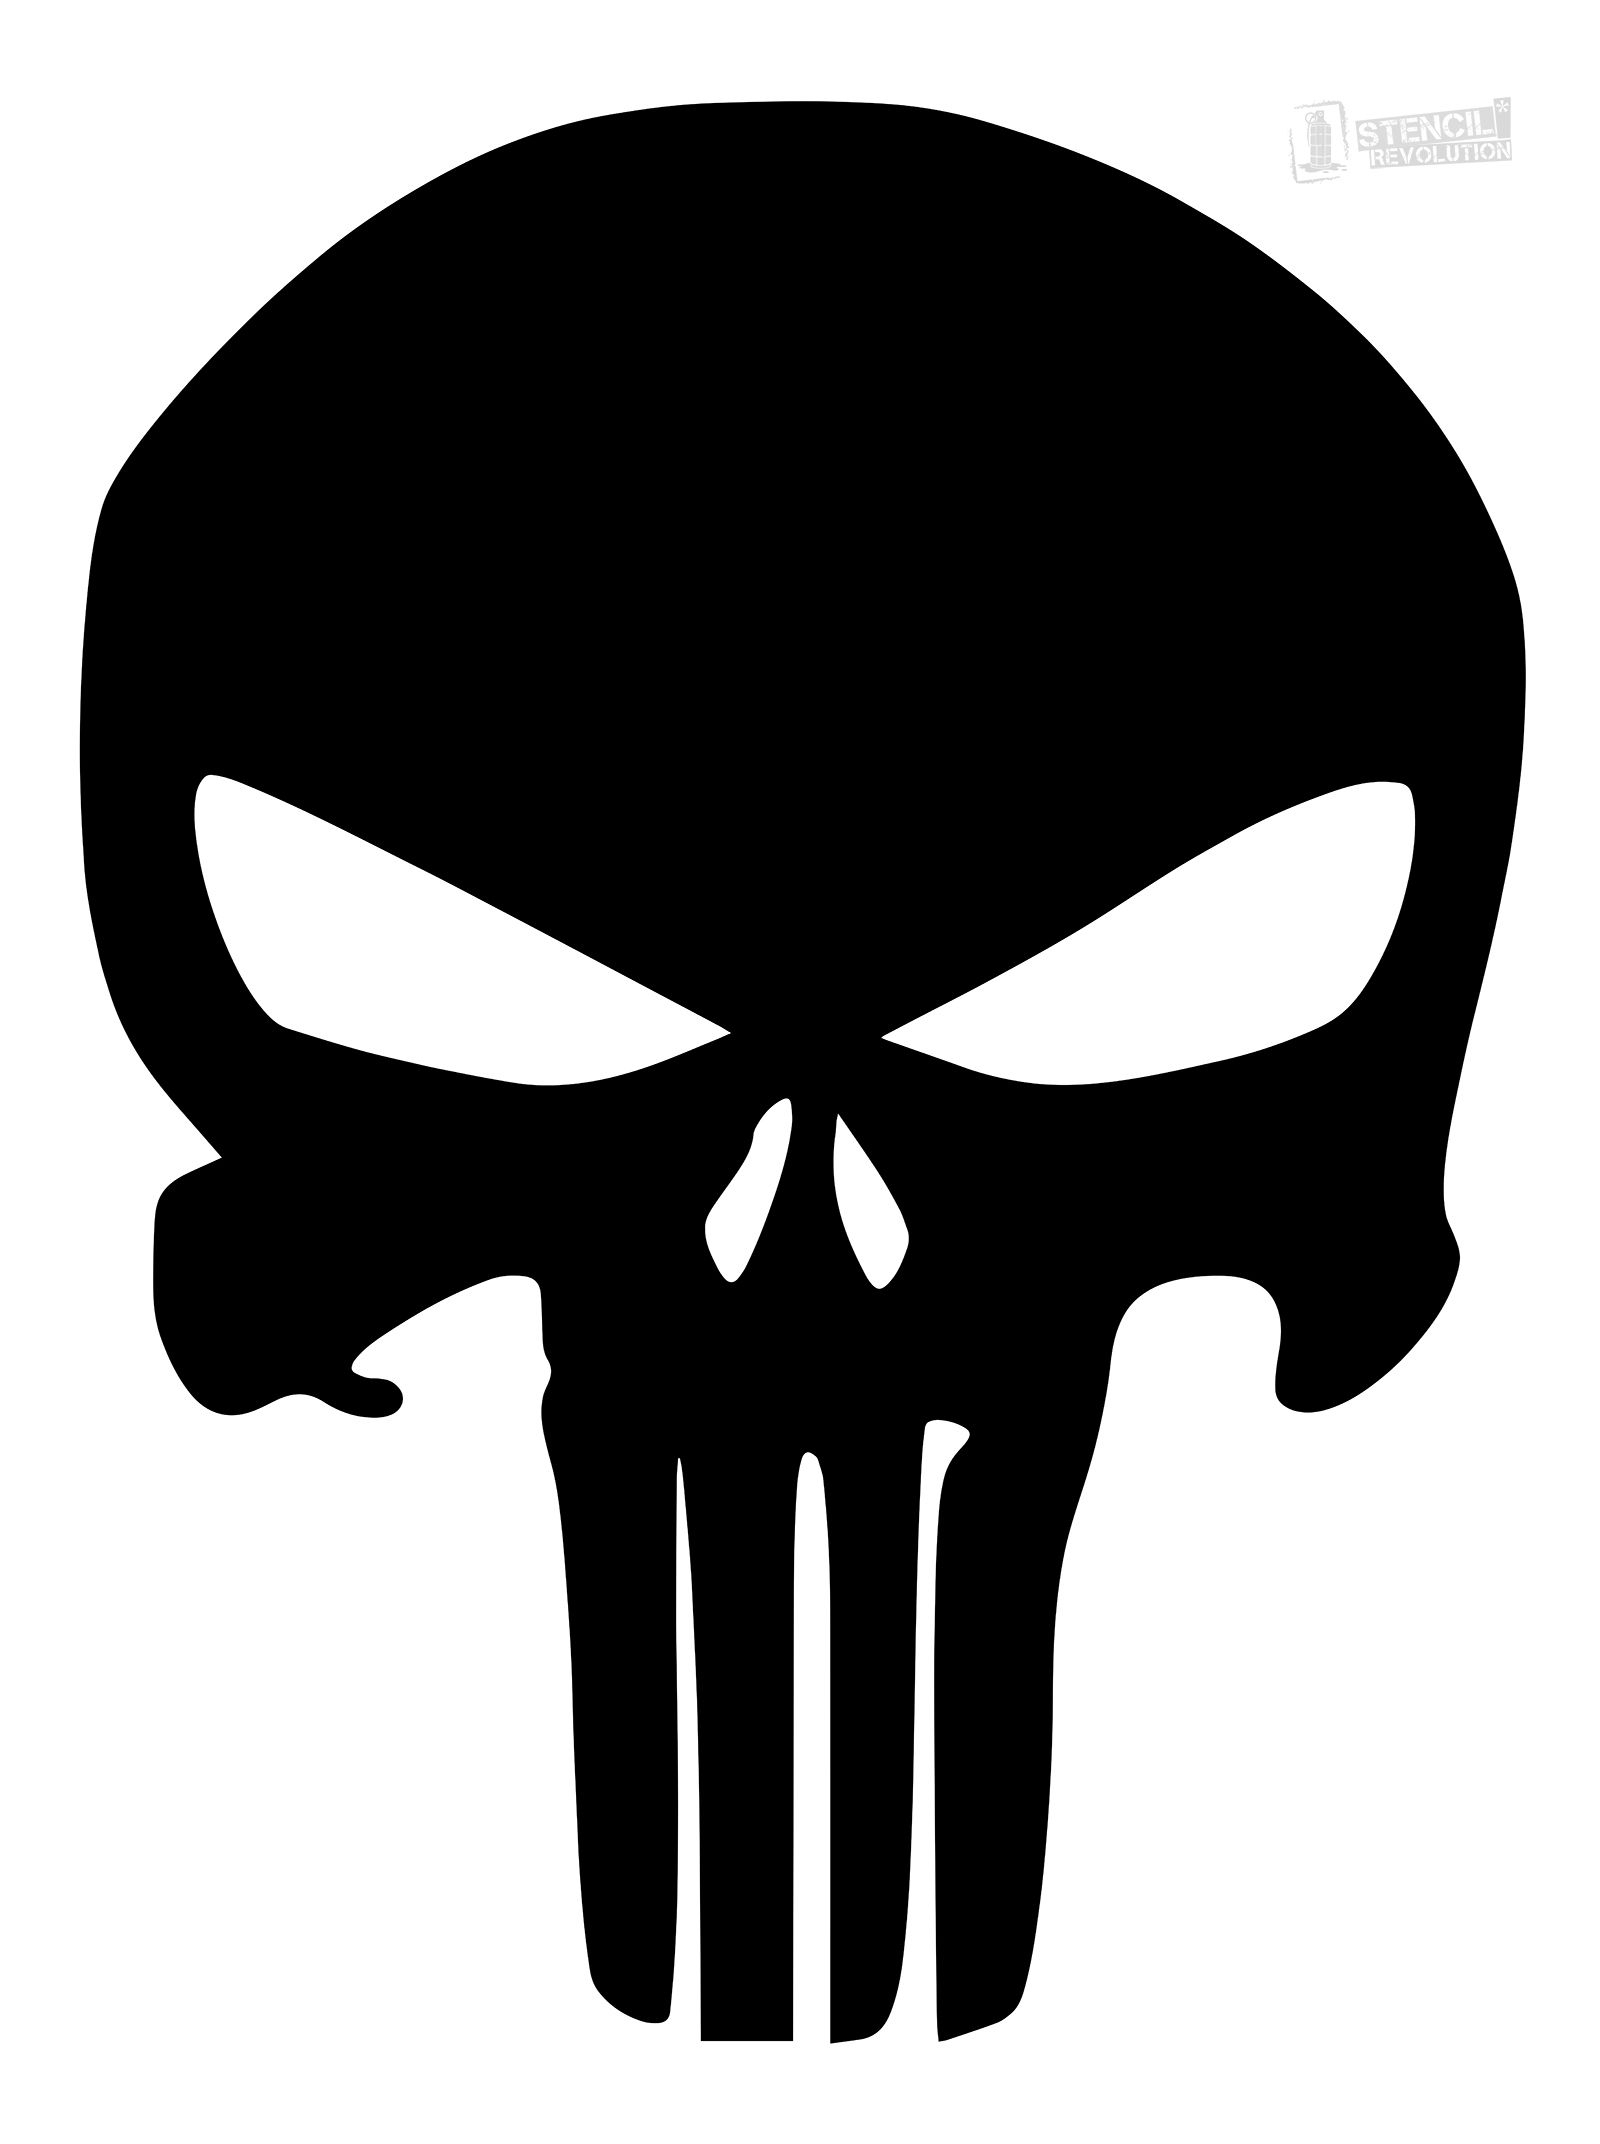 Punisher Skull Stencil | Firearms | Pinterest | Skull Stencil - Skull Stencils Free Printable